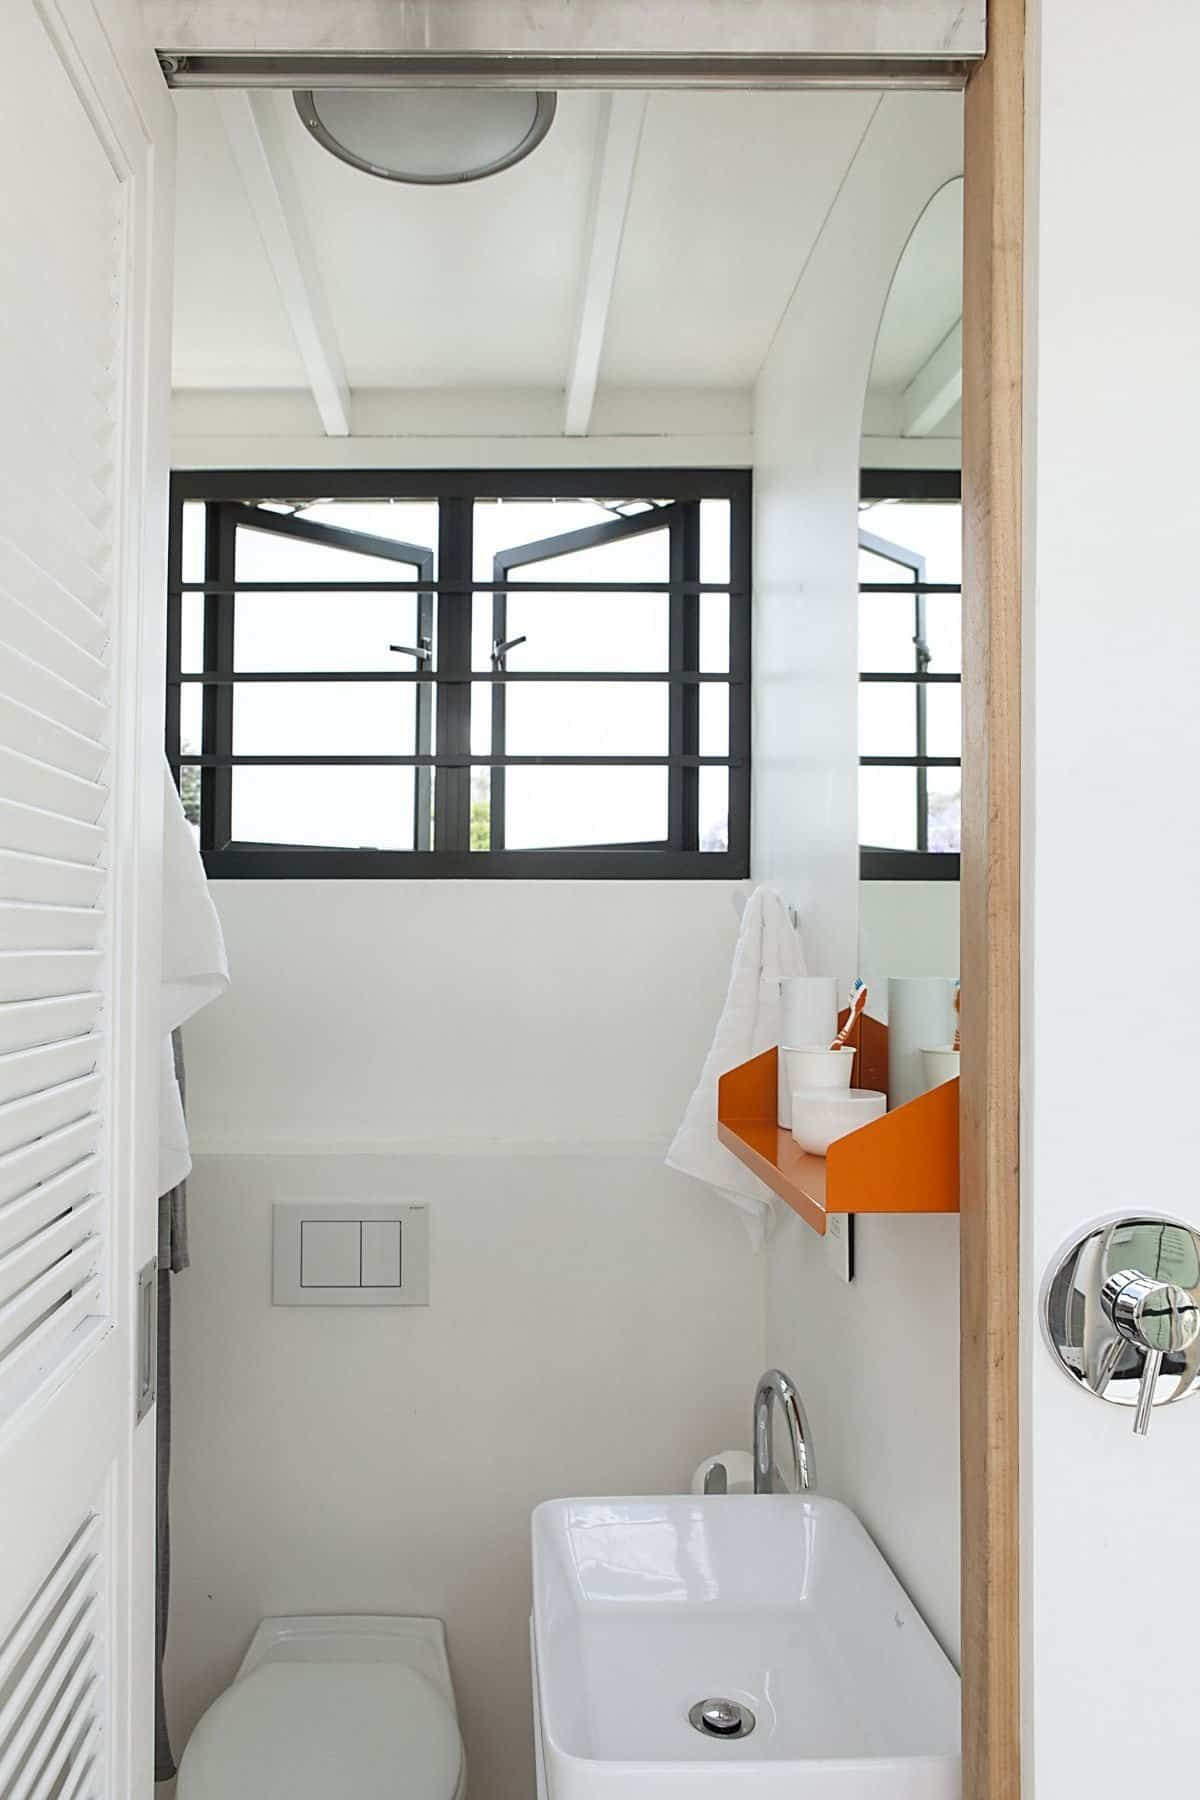 Pop iDladla ventana del baño